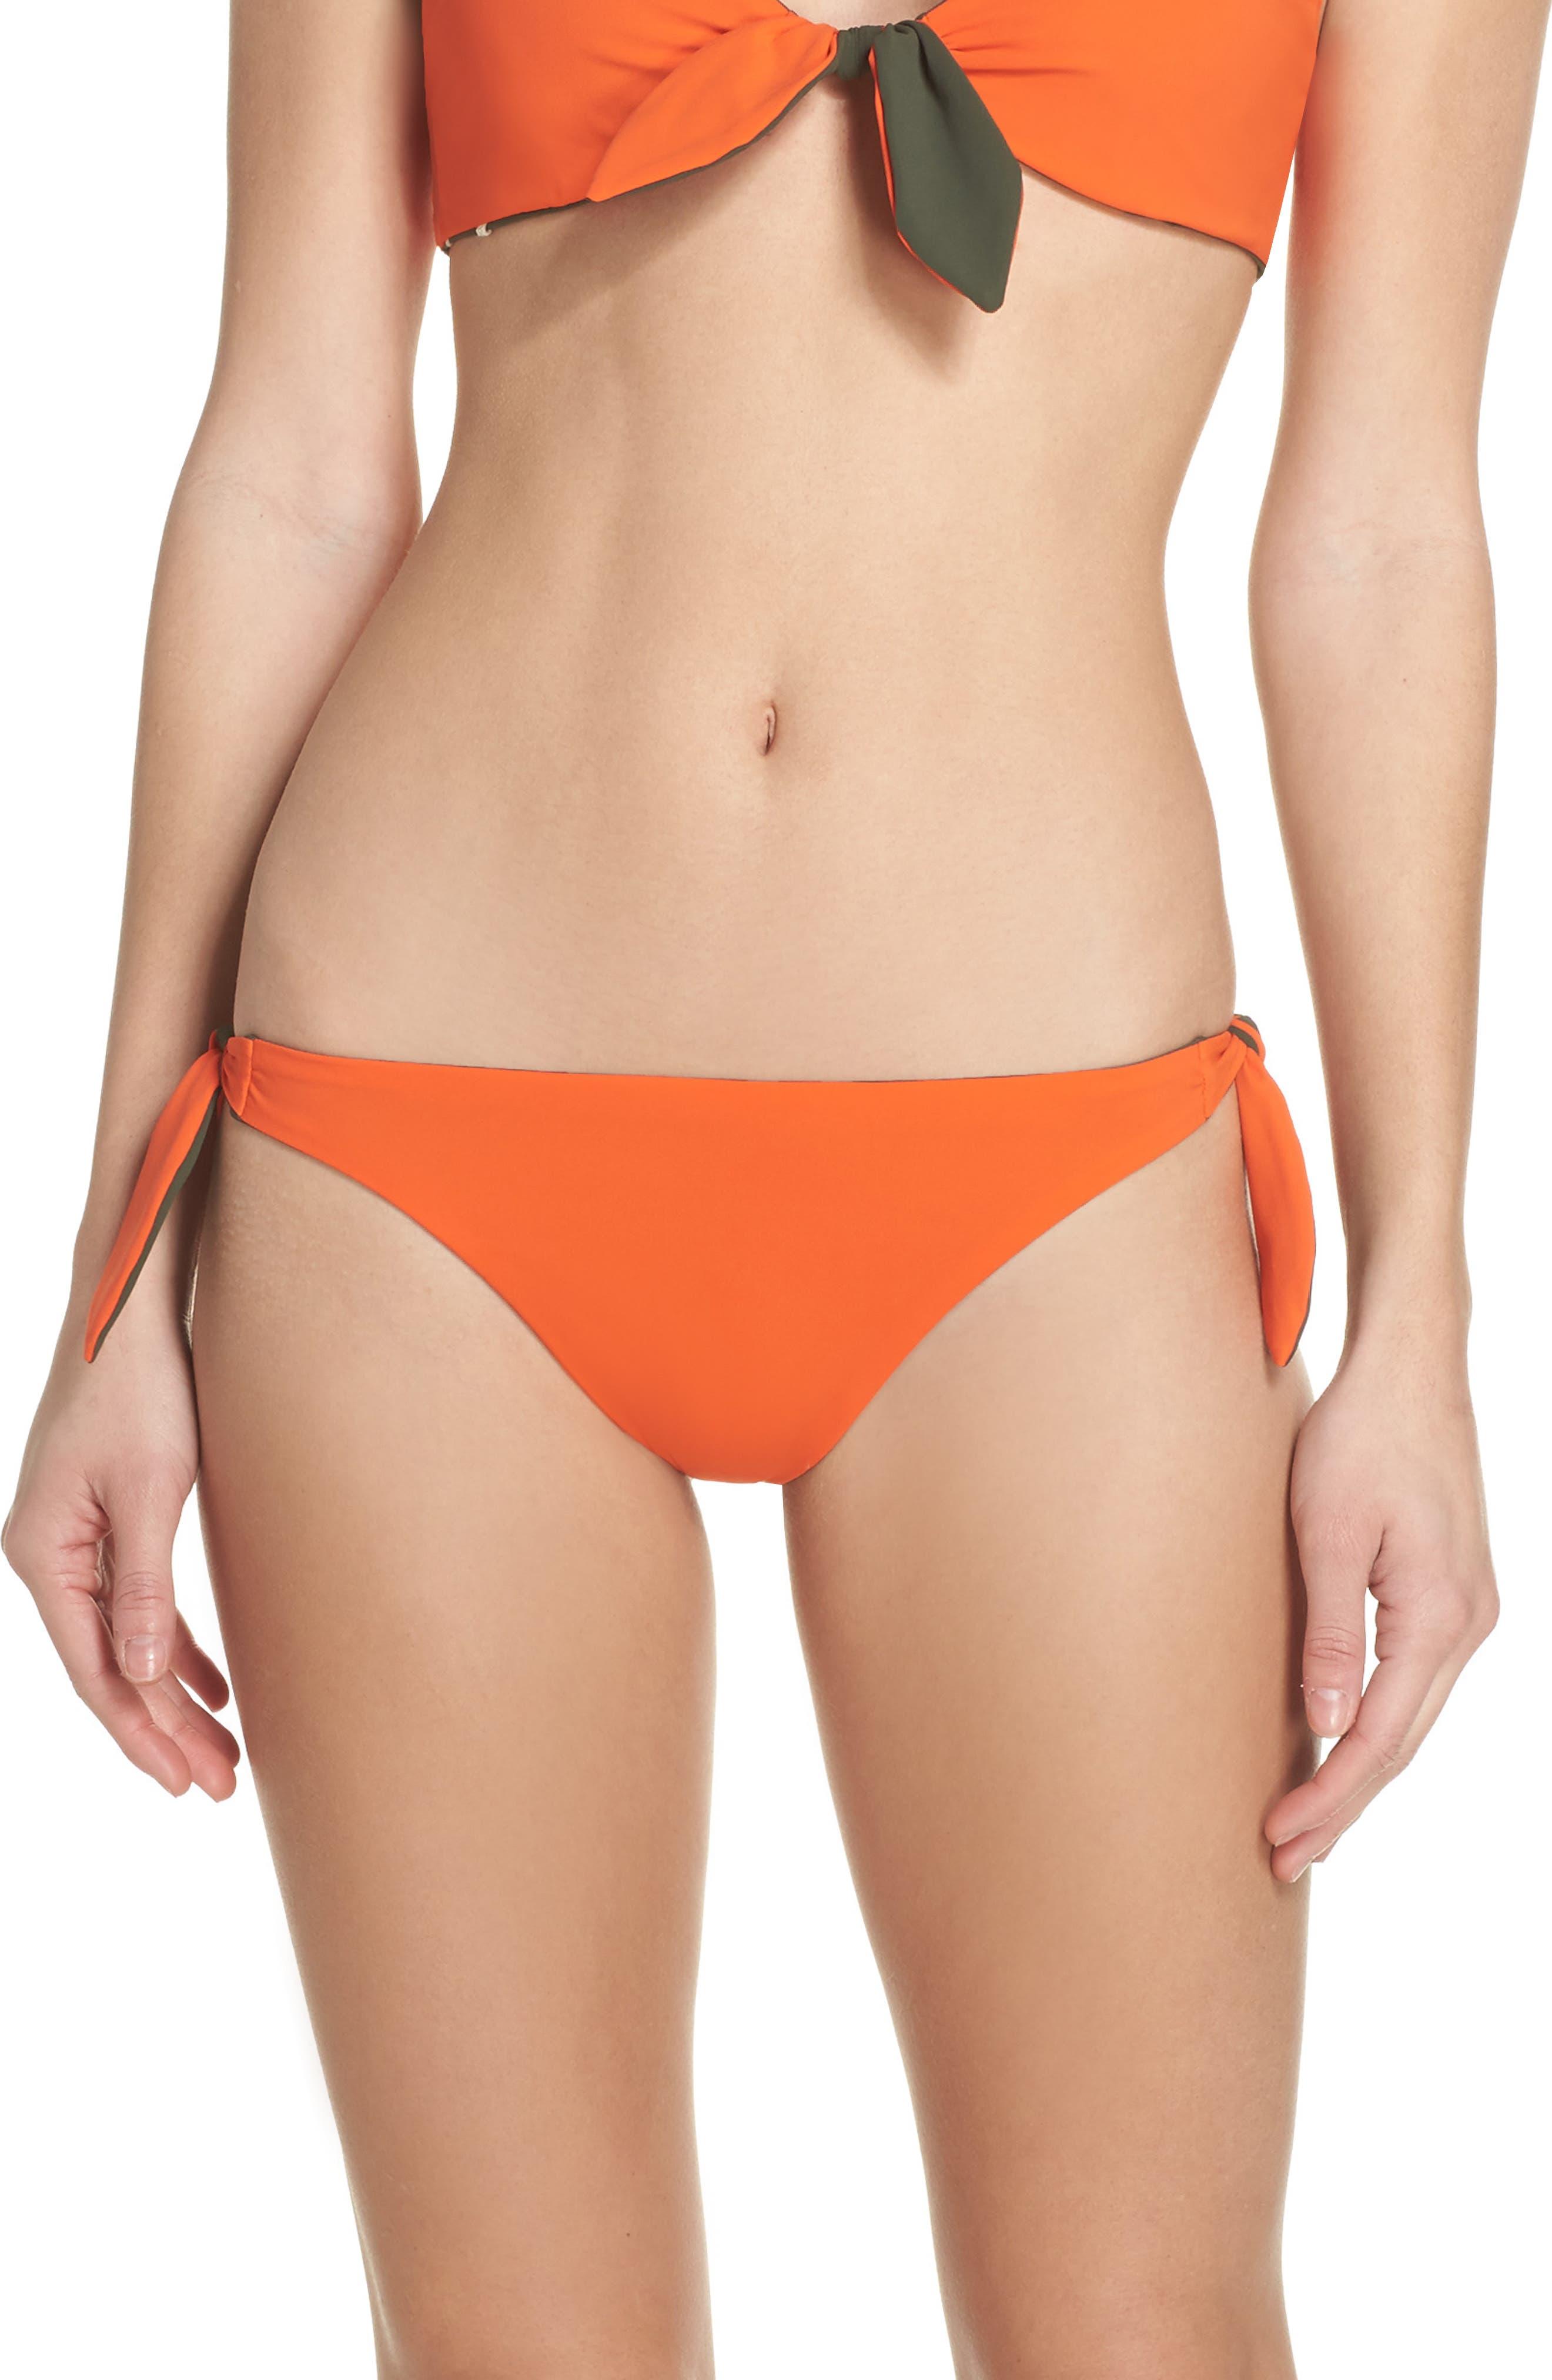 Biarritz Reversible Bikini Bottoms,                             Alternate thumbnail 2, color,